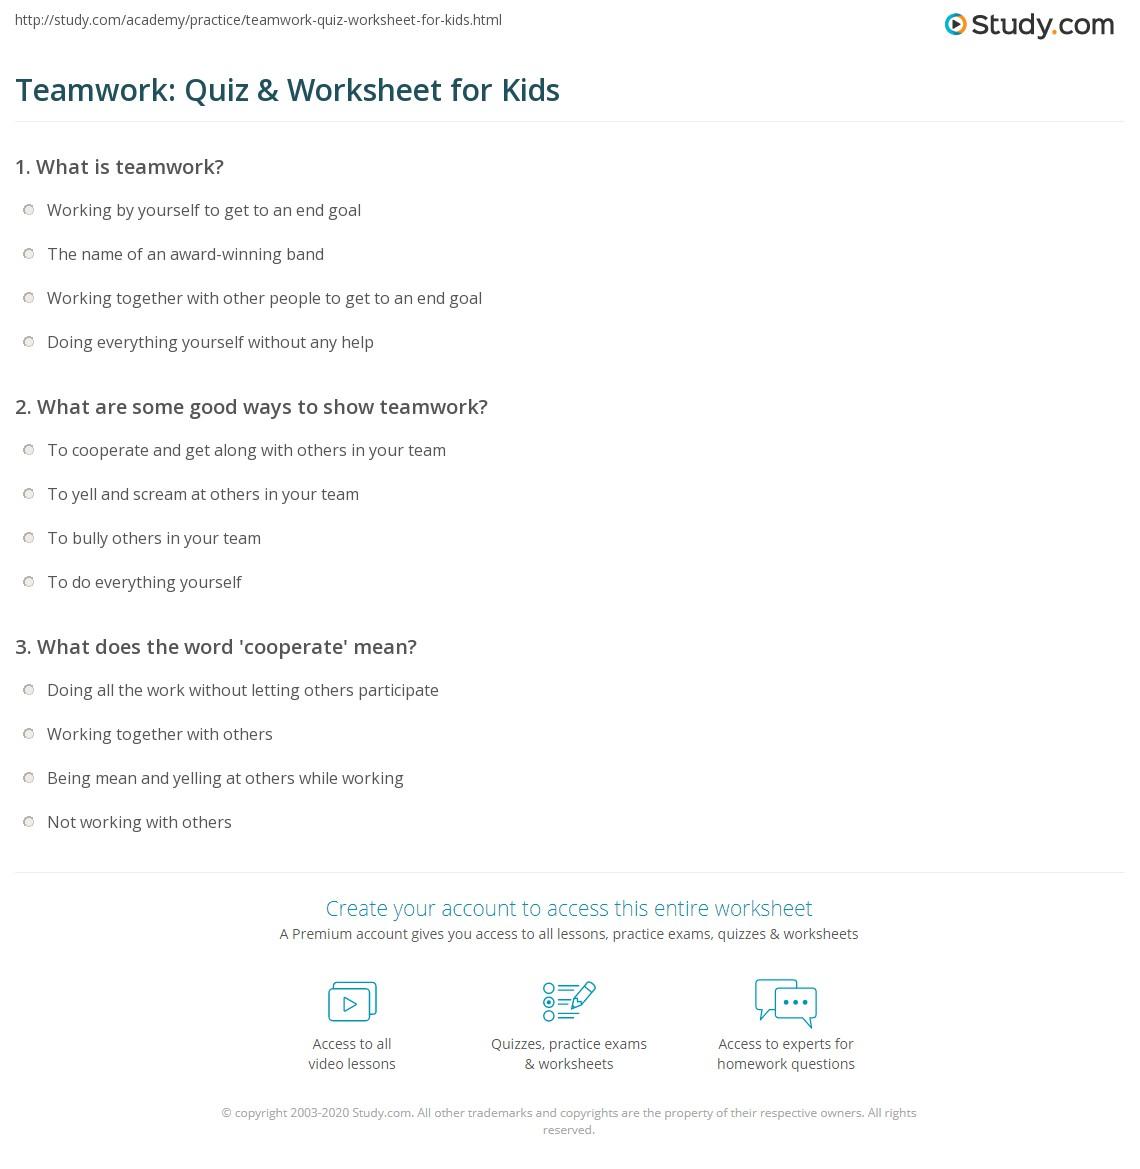 Teamwork quiz worksheet for kids - Quiz cuisine francaise ...